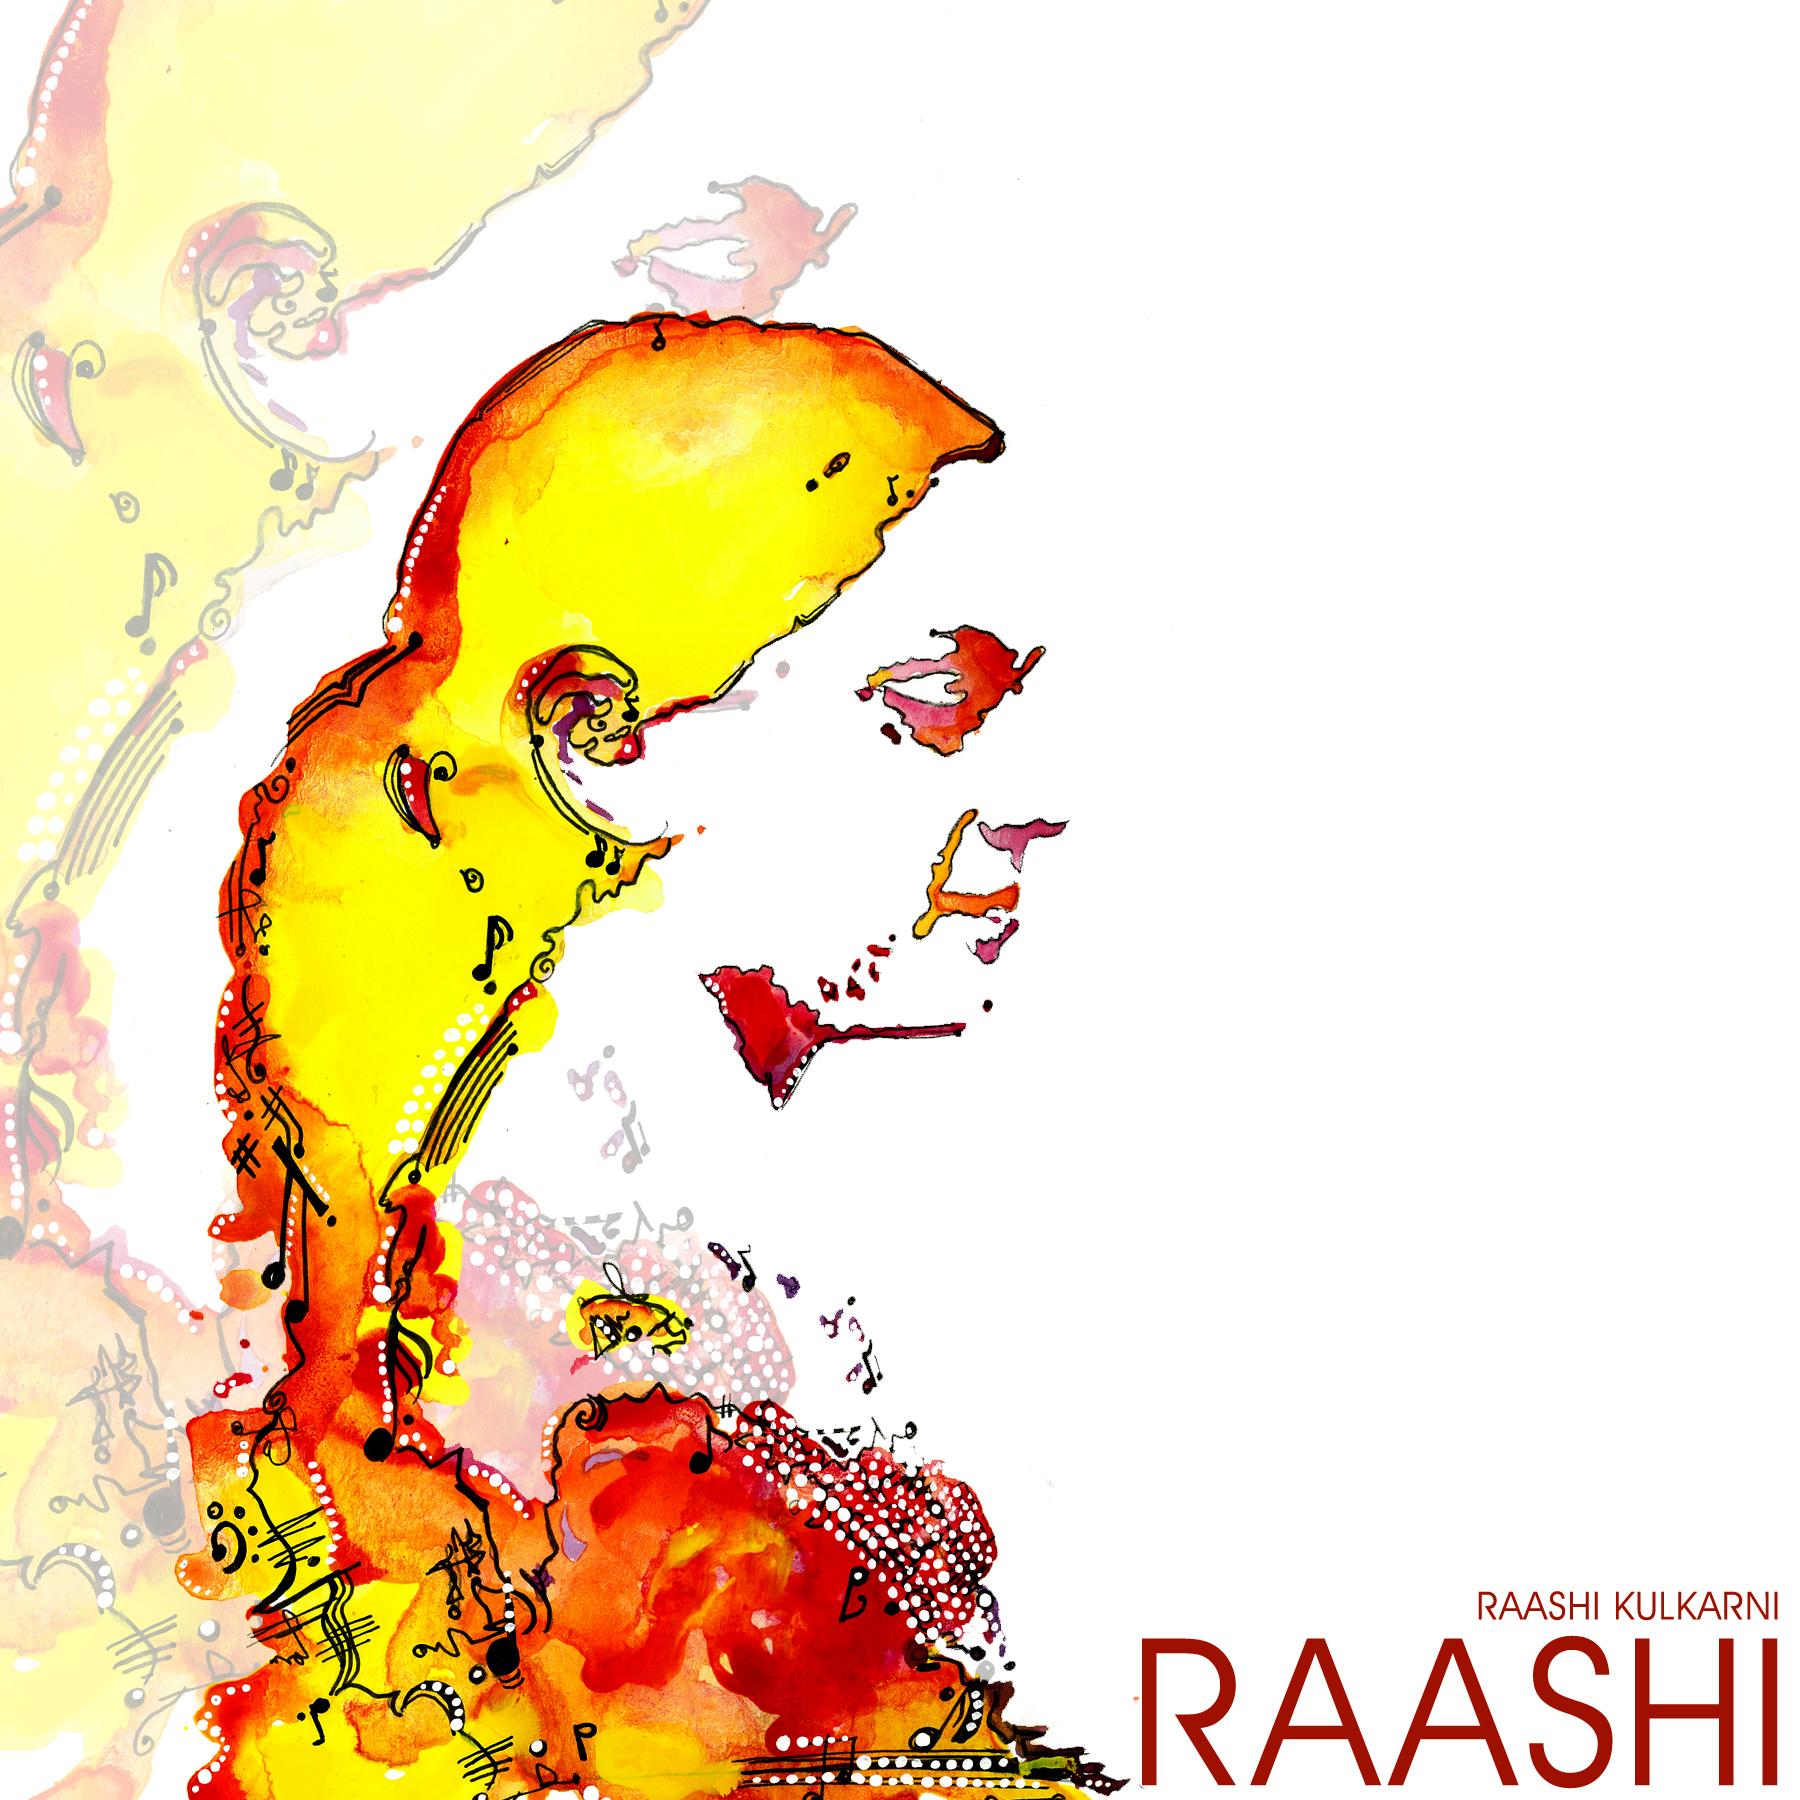 Raashi's debut EP now available worldwide.